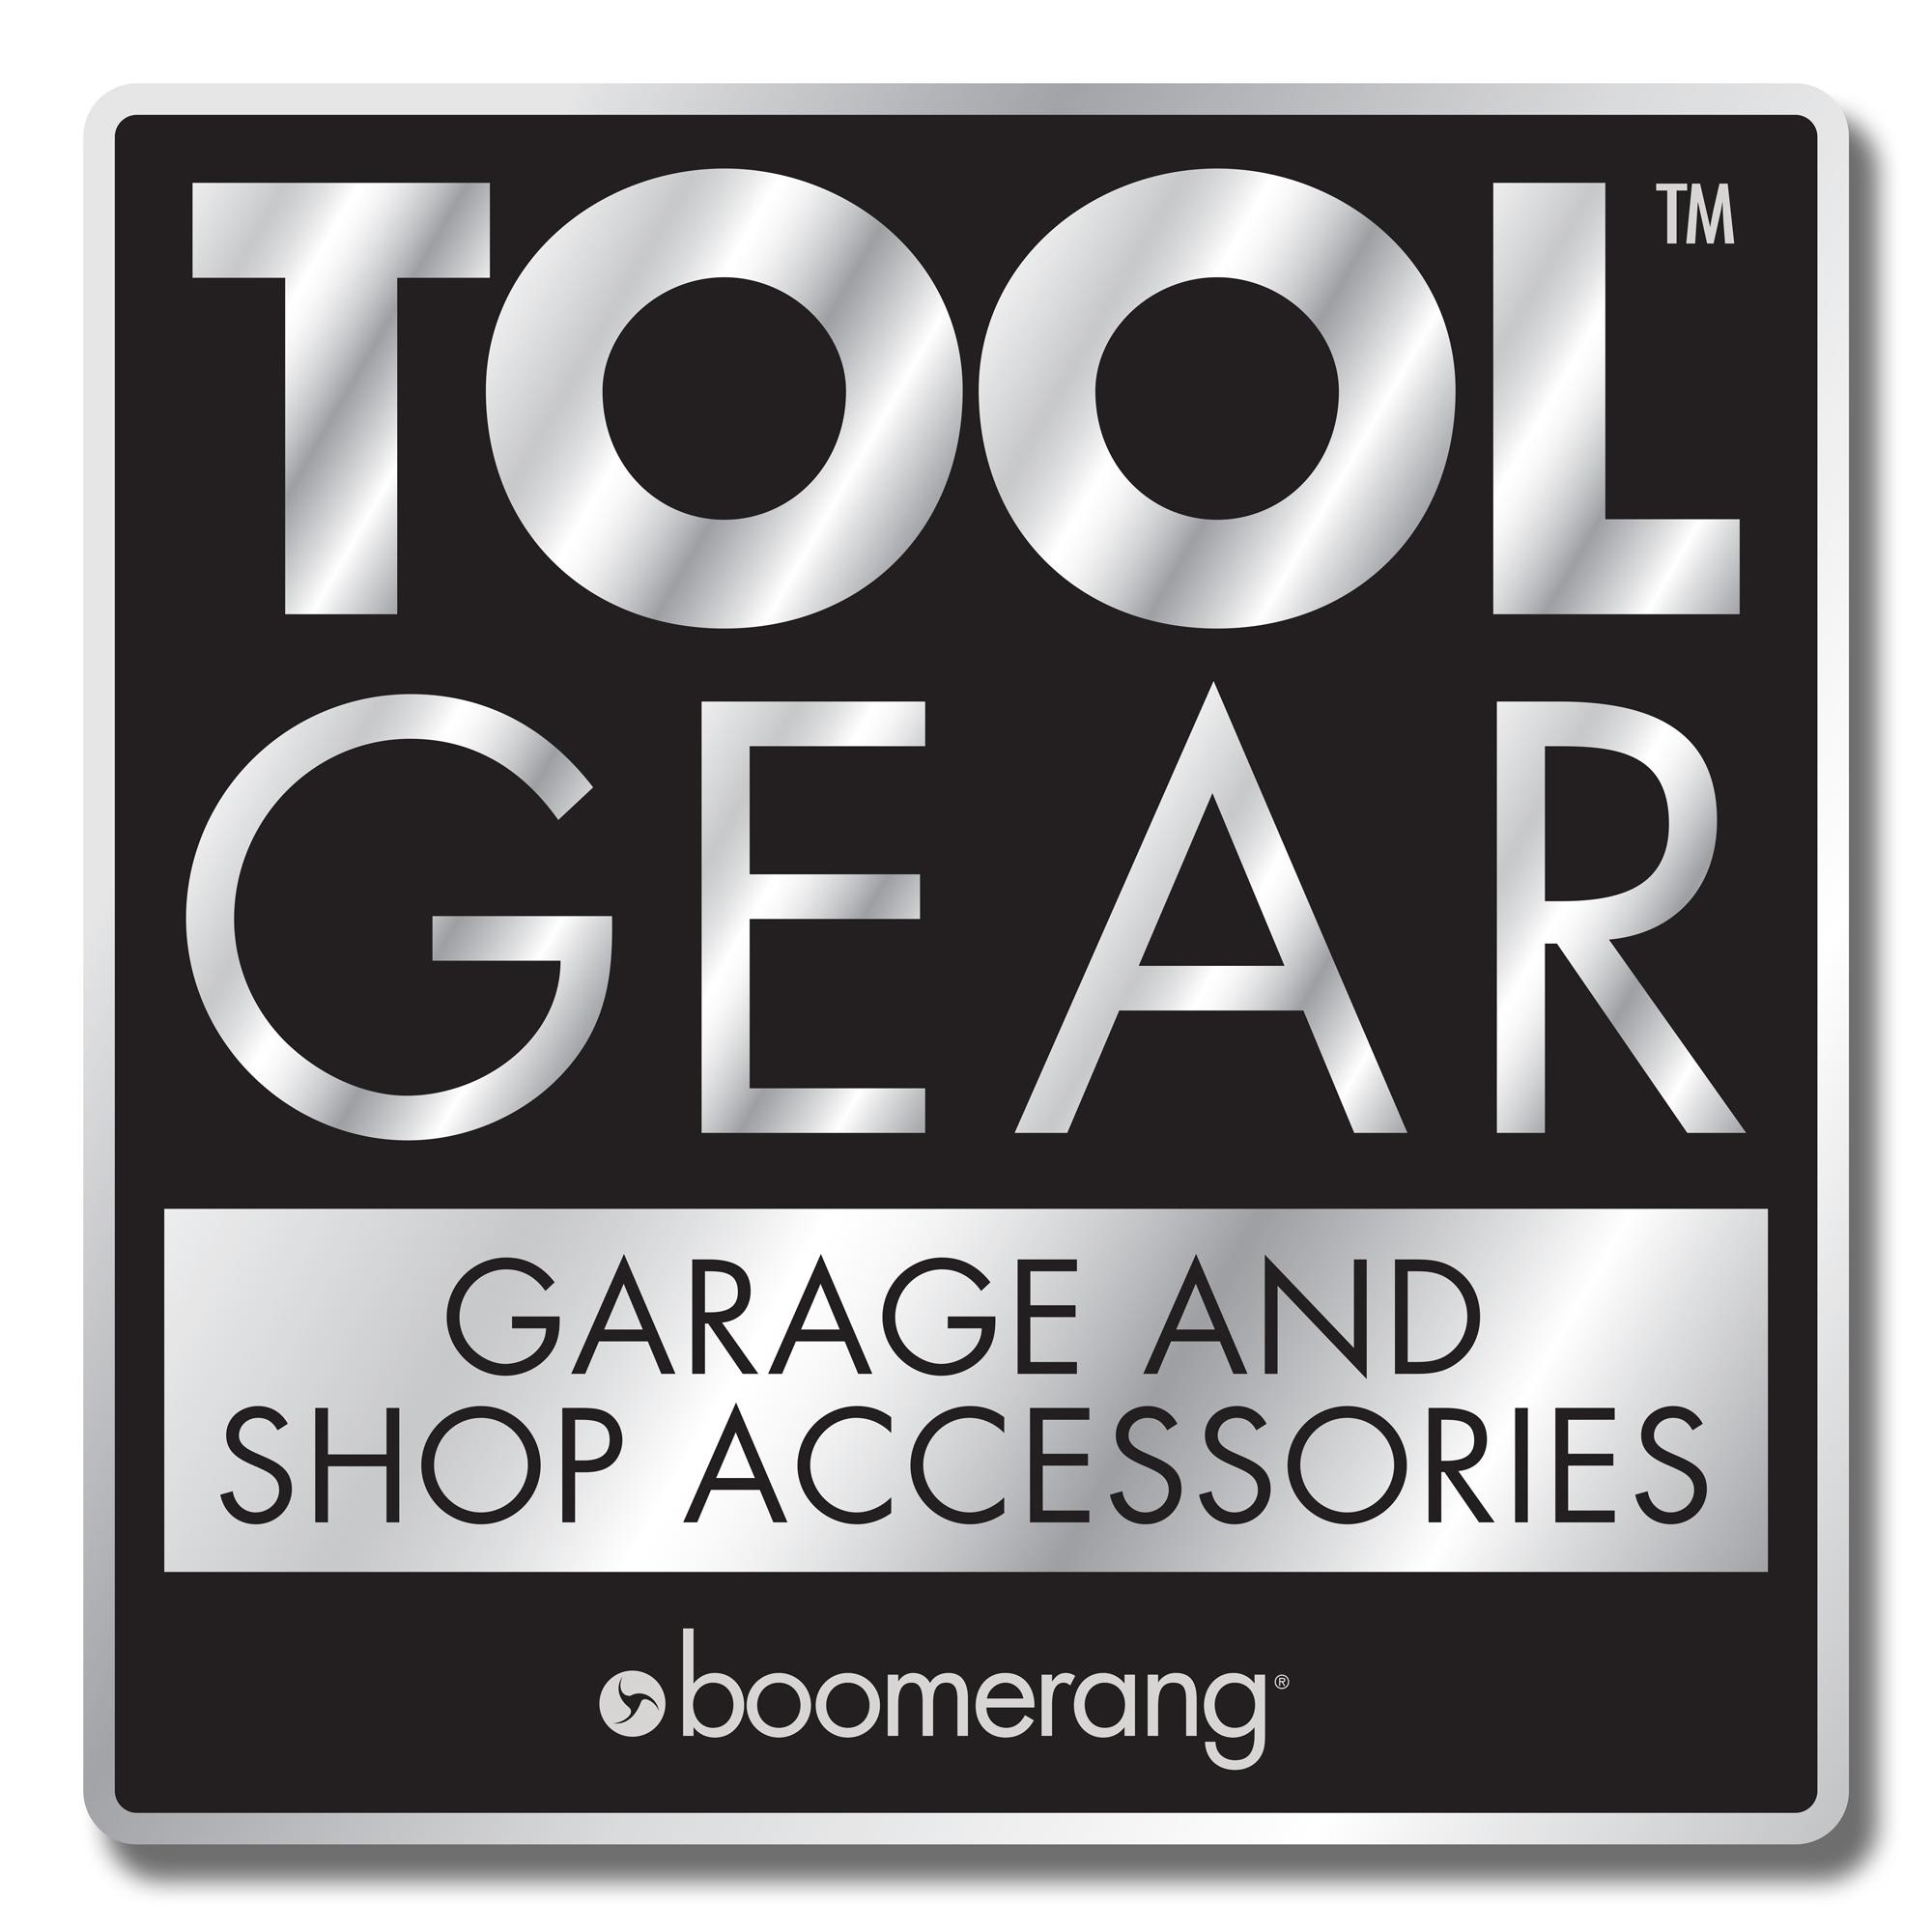 toolgear-logo-2000x2000.jpg